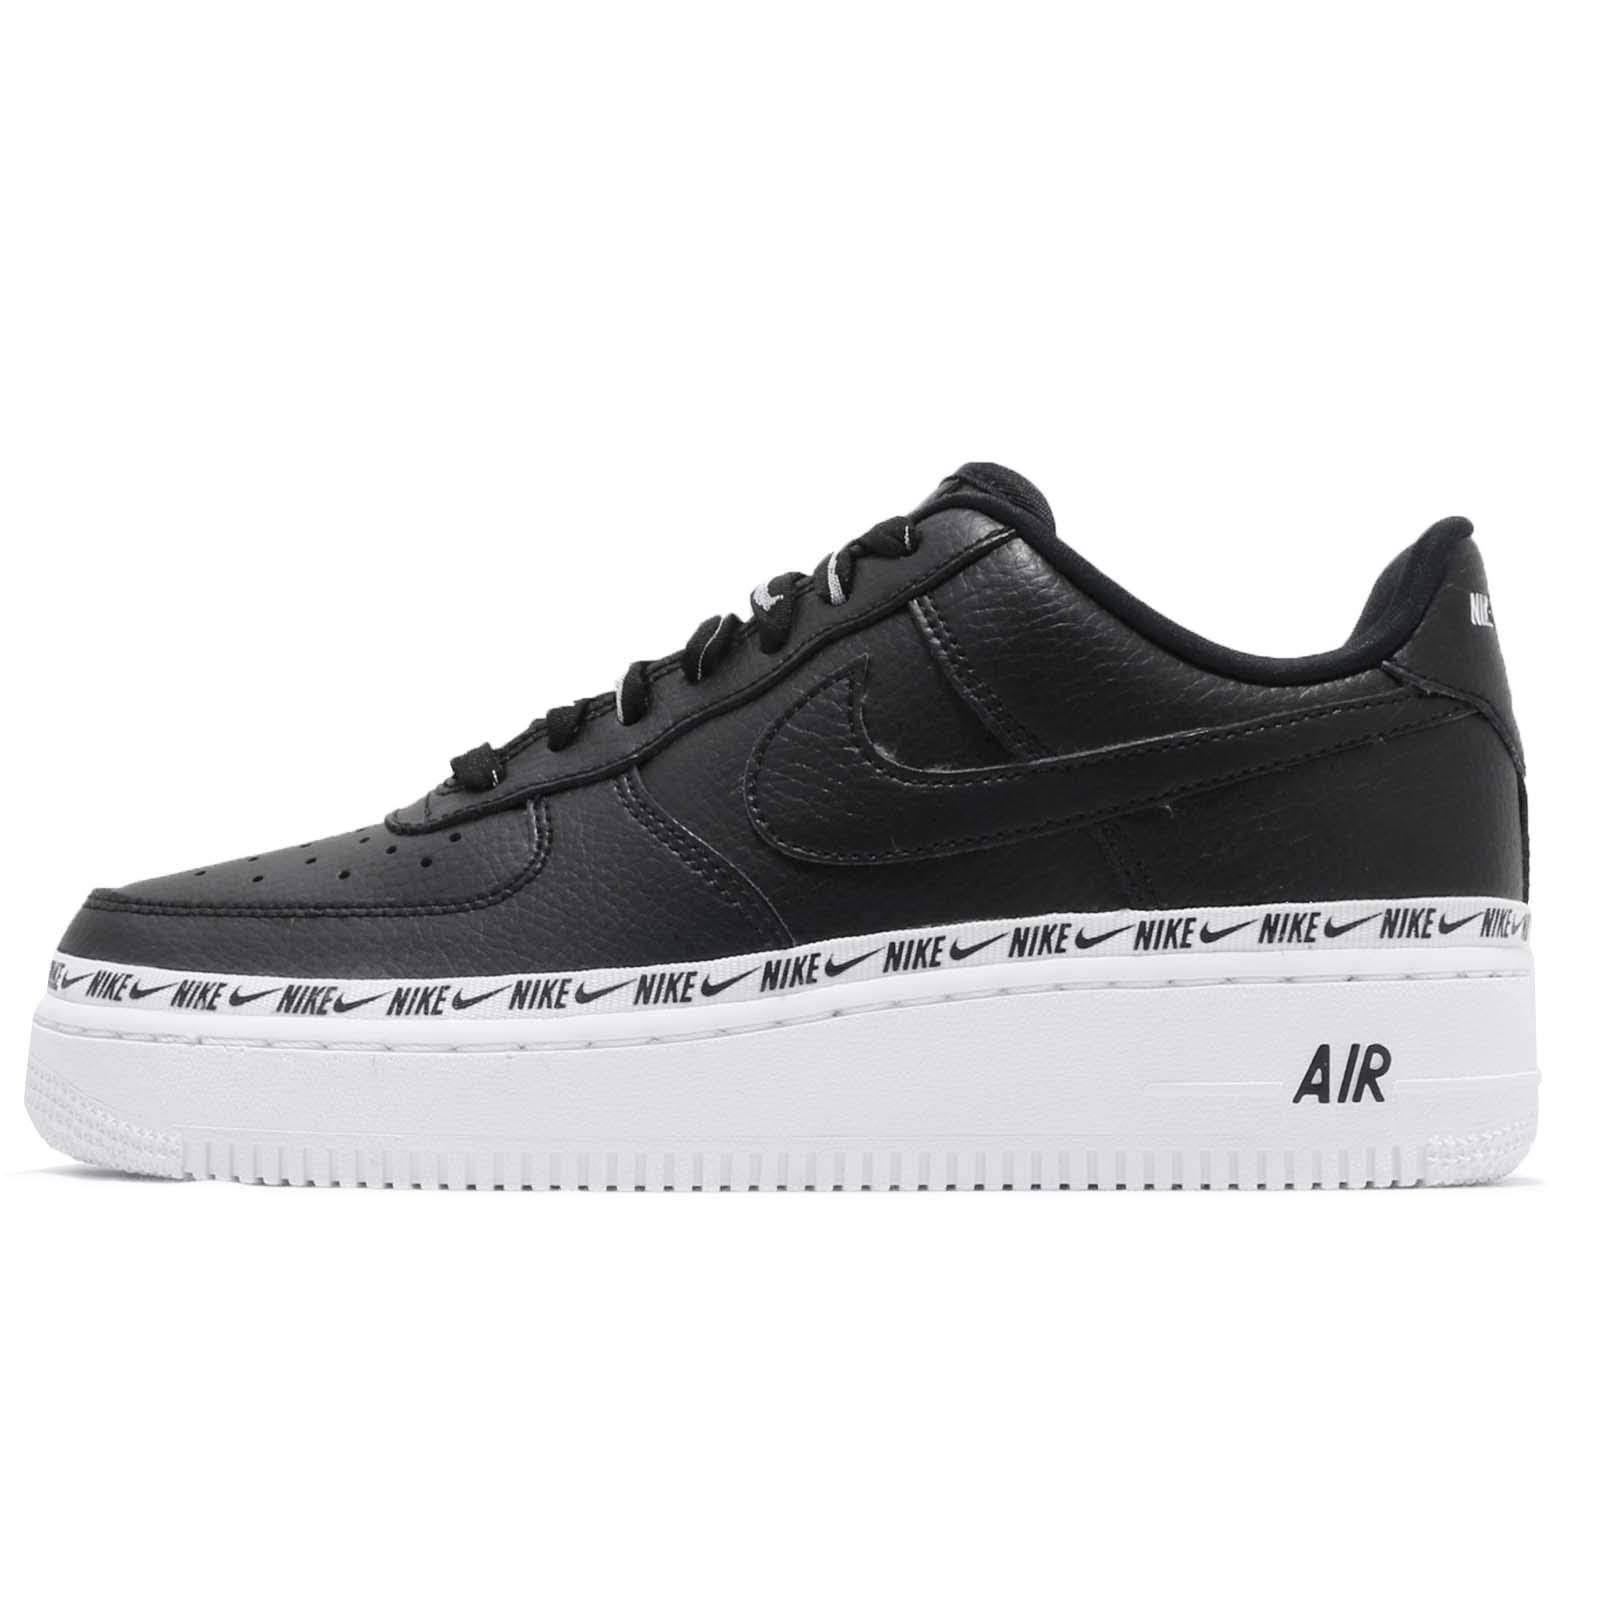 7 07 Zapatos Force Mujer Premium Nike Tamaño Se Negro Ah6827002 Air De 5 1 1xPqnpqwRt